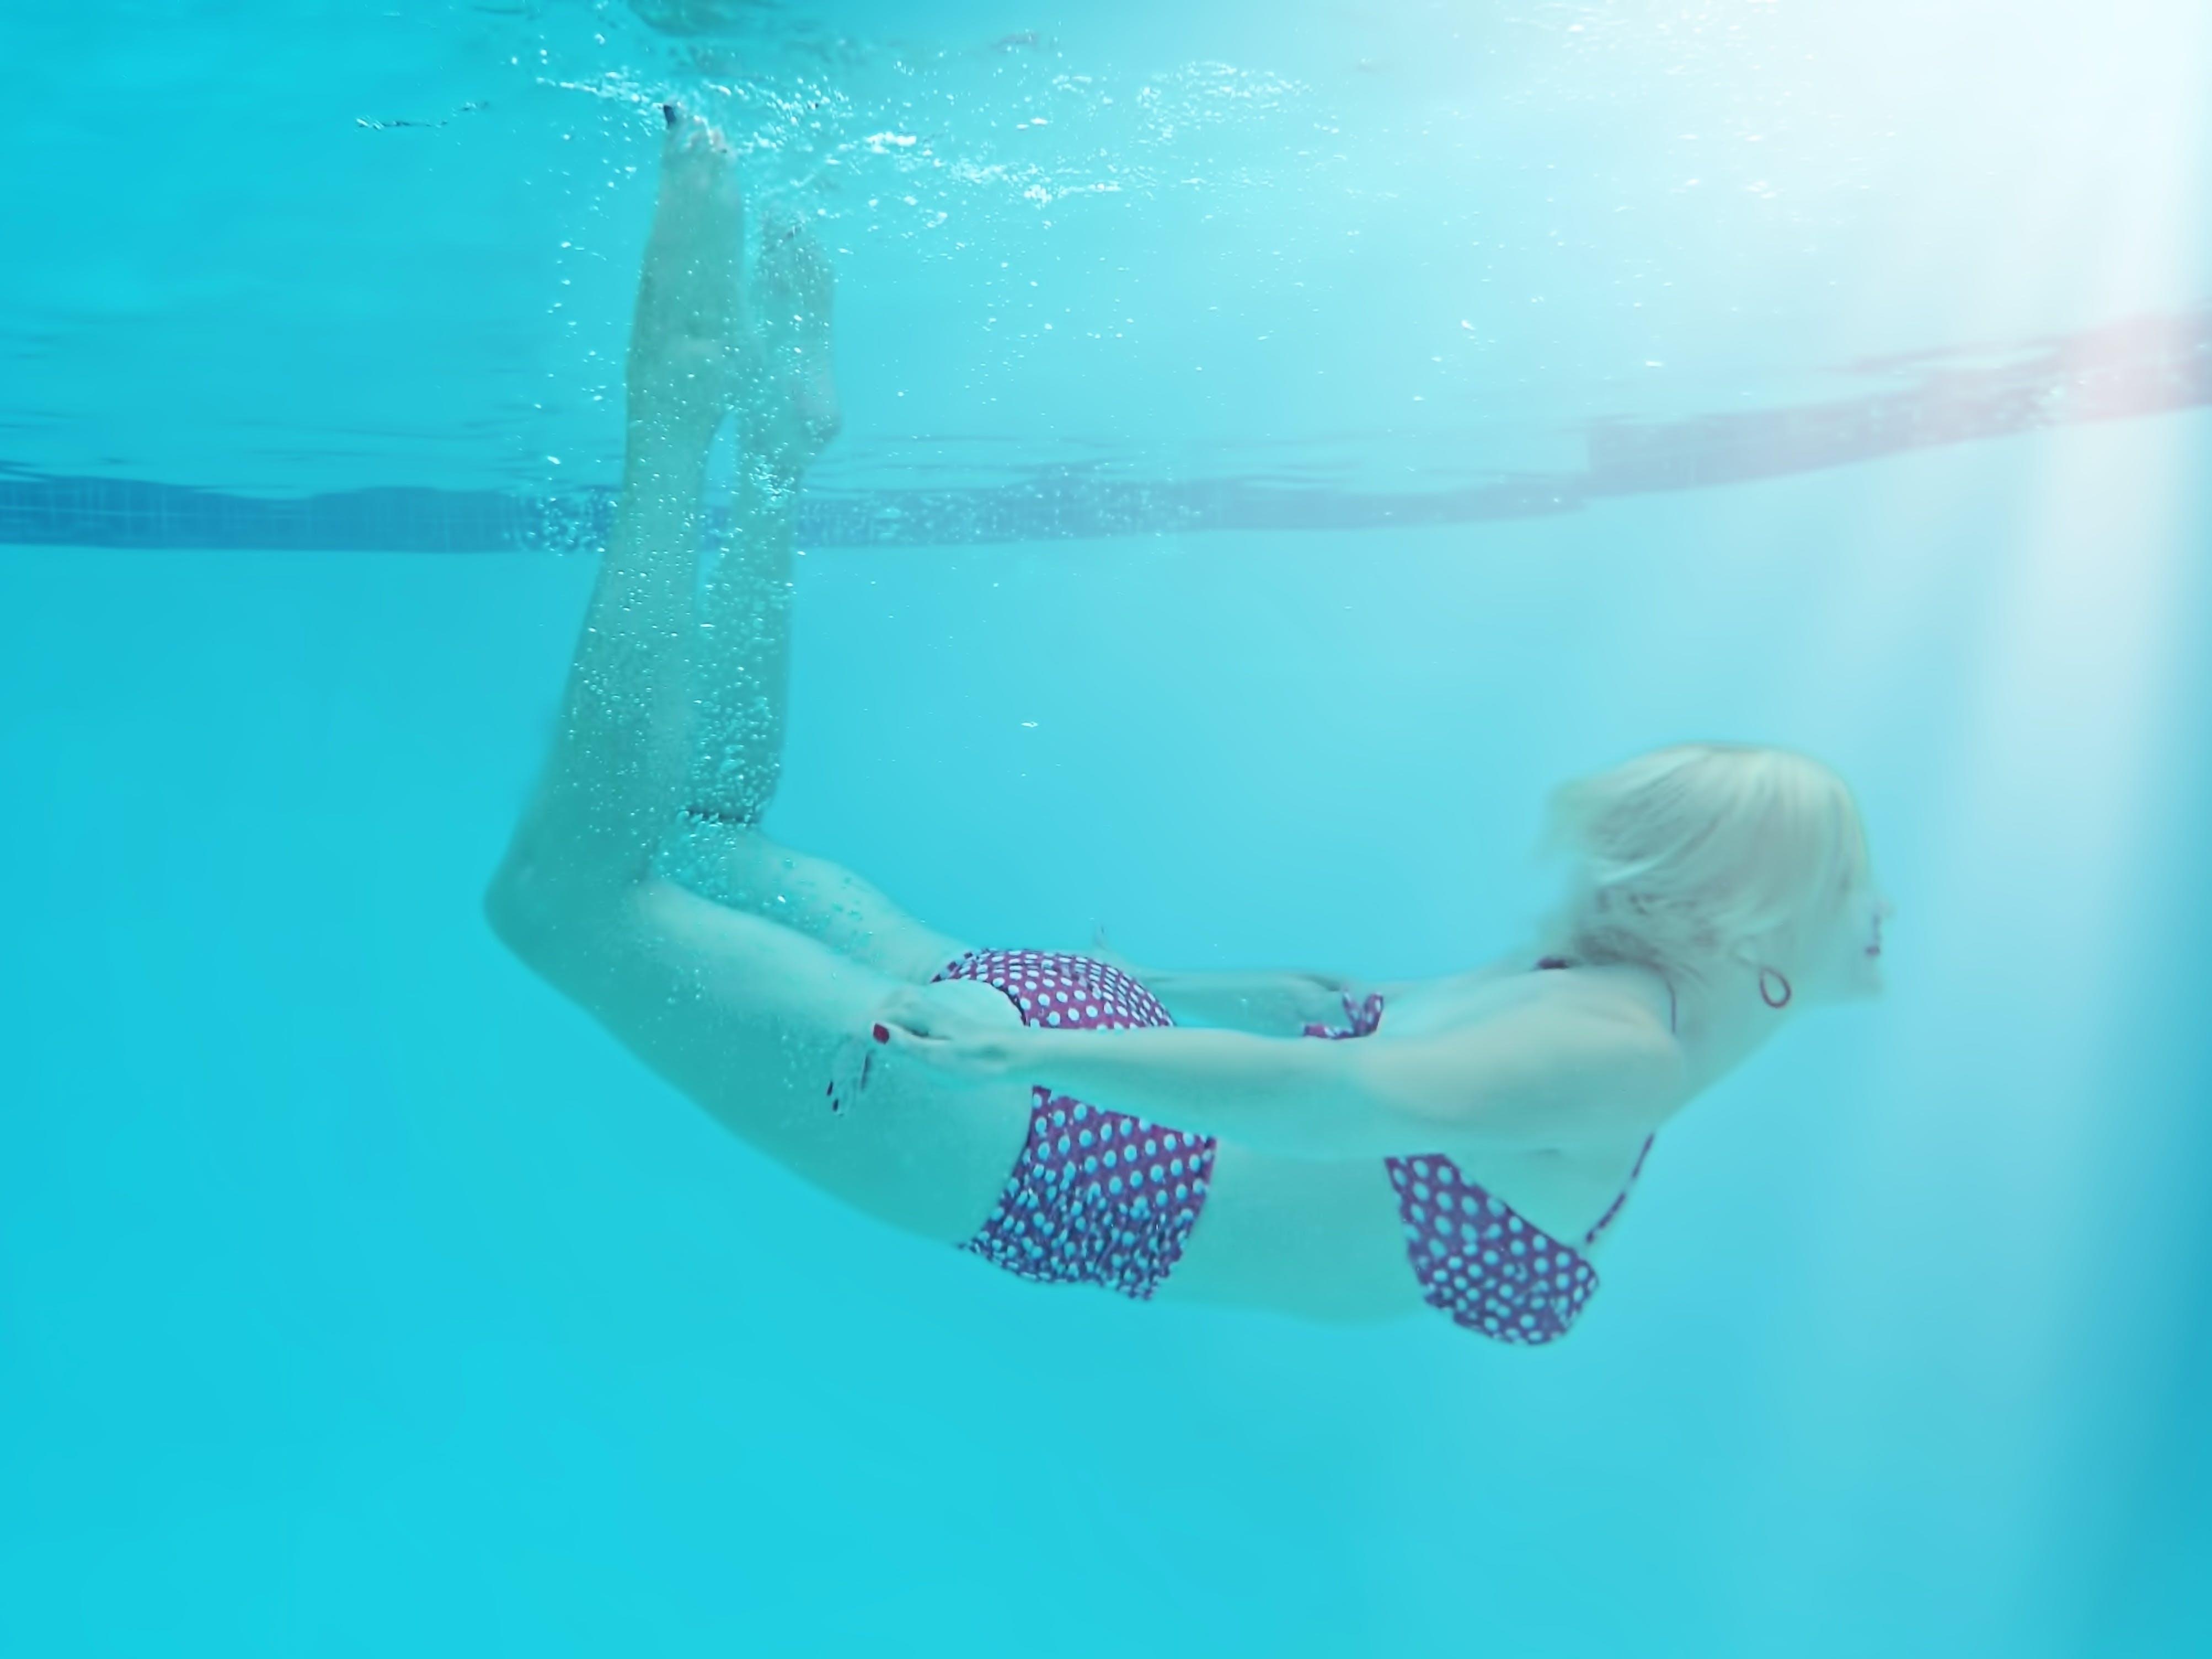 diving, fitness, fun